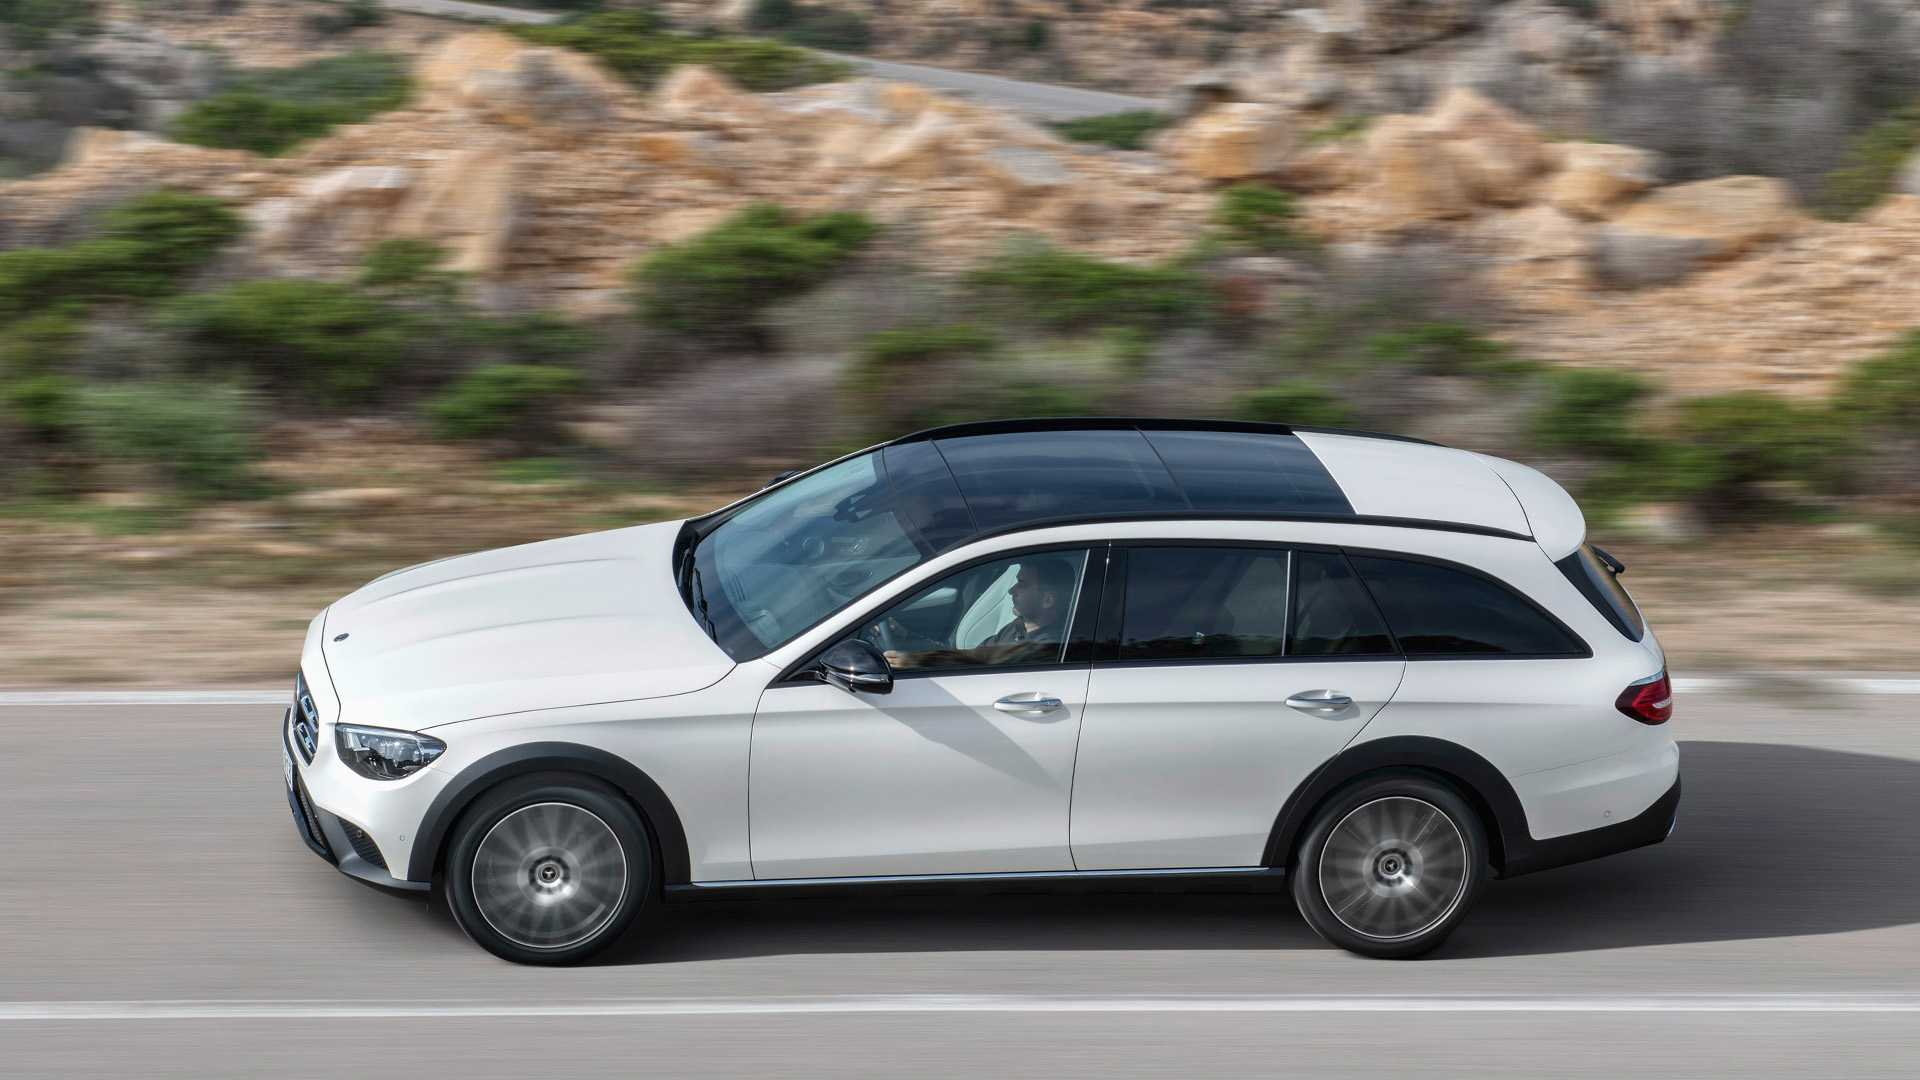 Mercedes-Benz Clase E Restyling (2020) 9